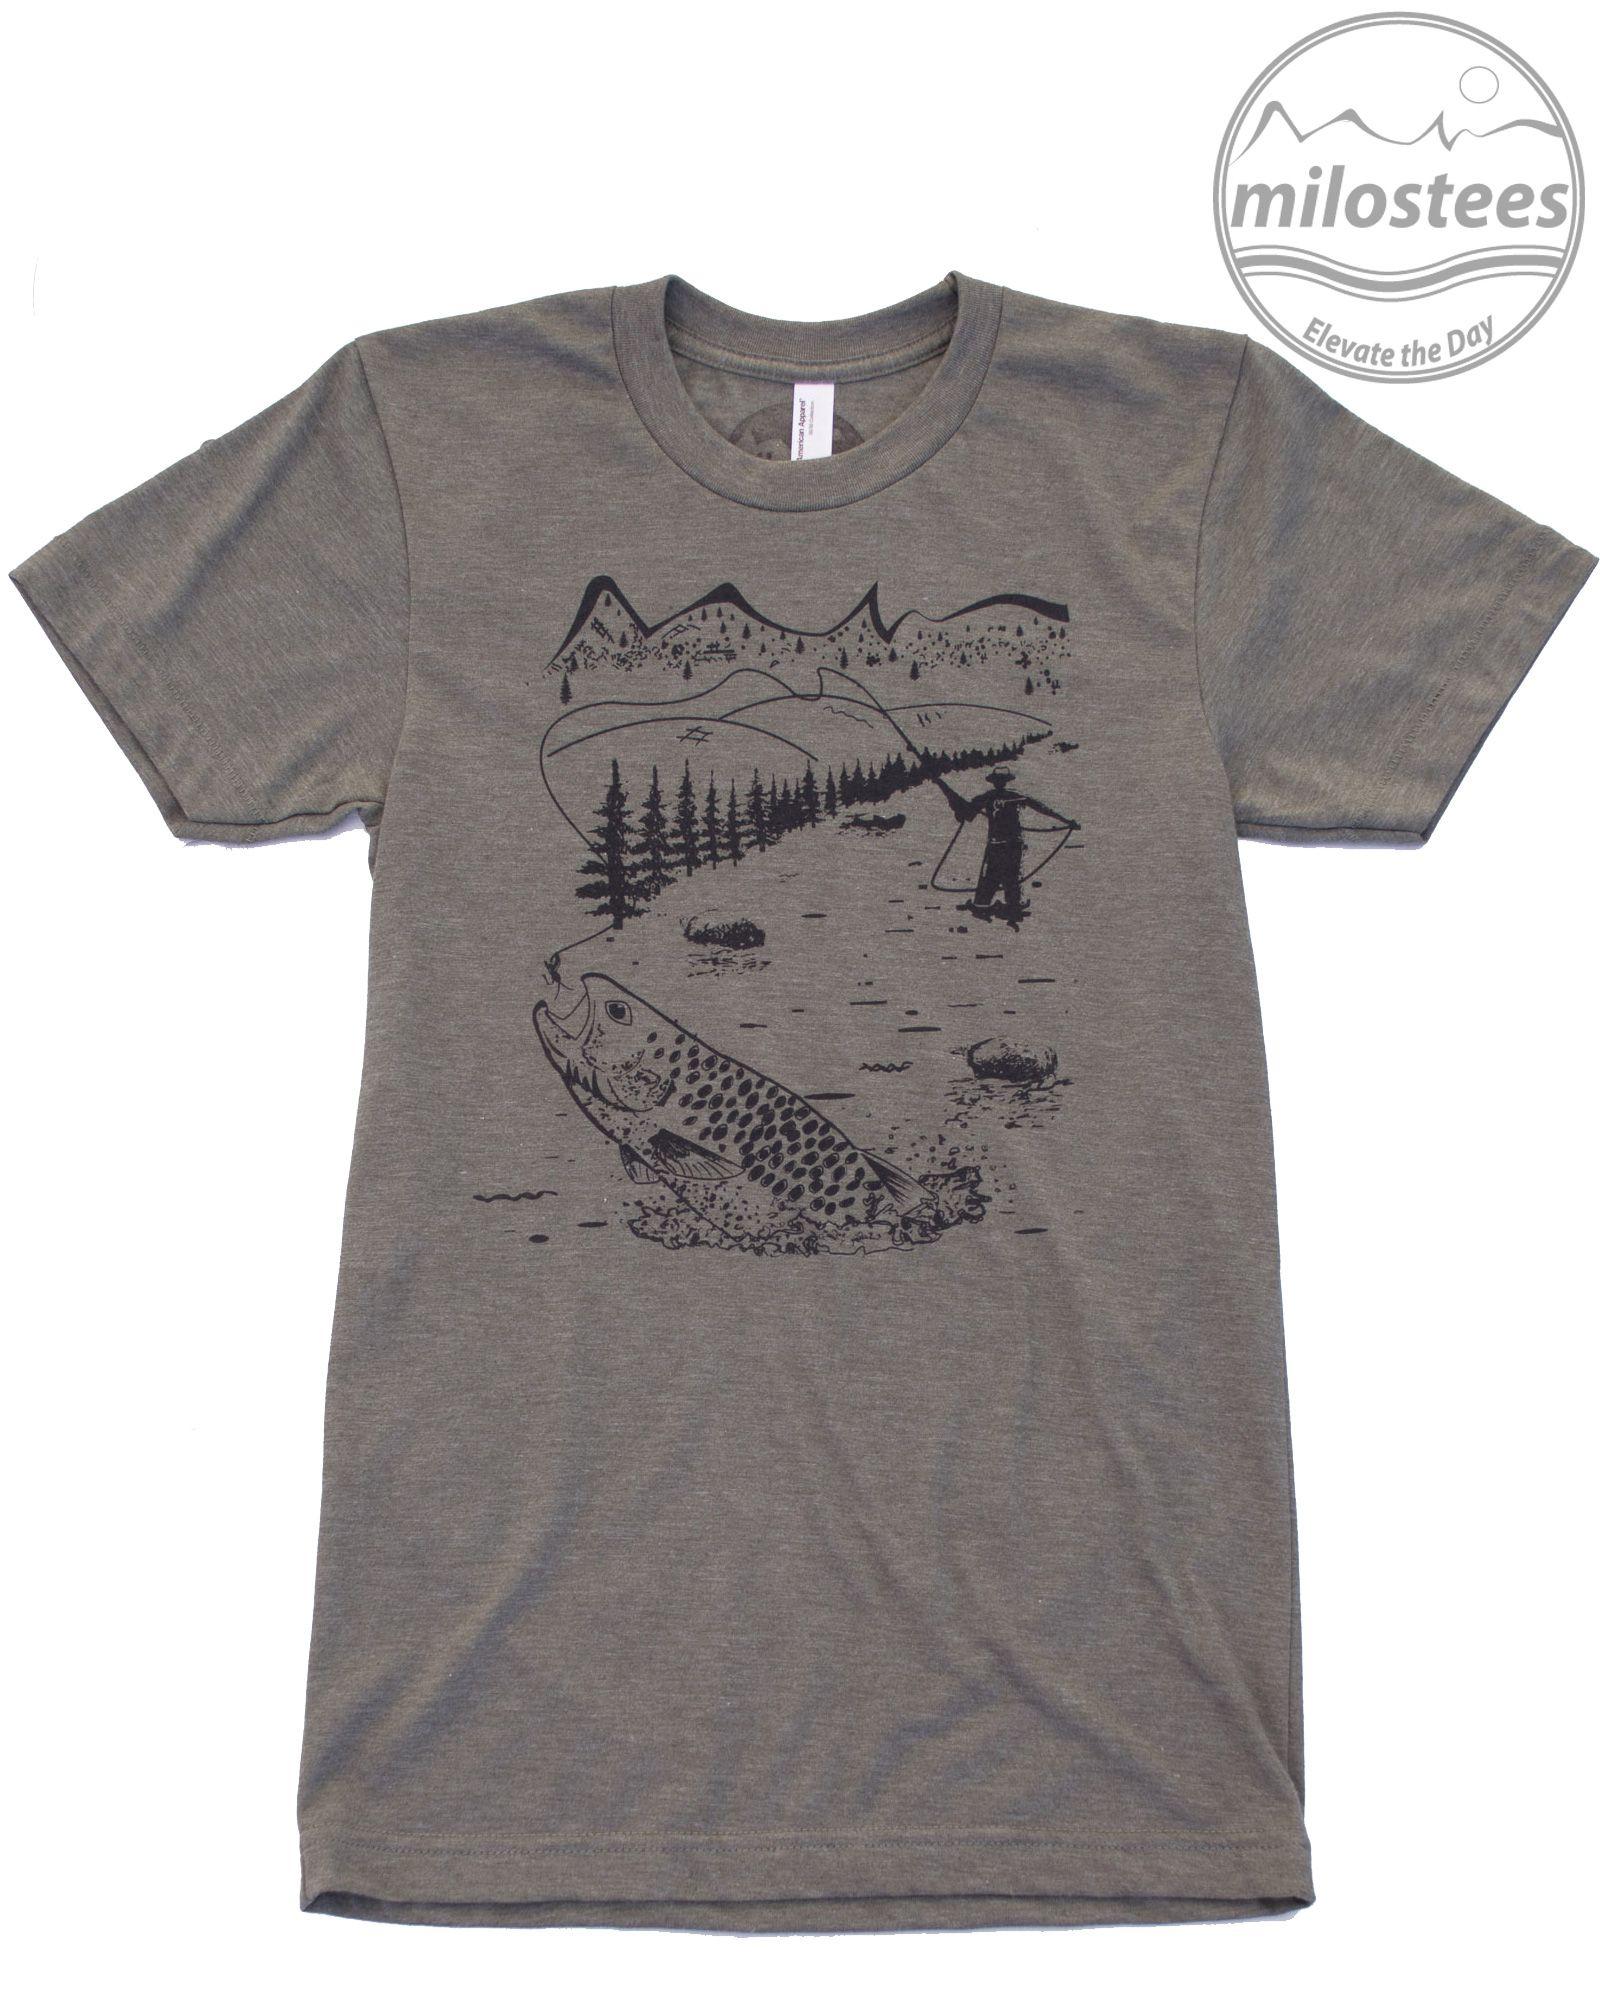 Graphic Fly Fish Shirt Soft Wear Fly Fishing Shirts Fishing Shirts Shirts